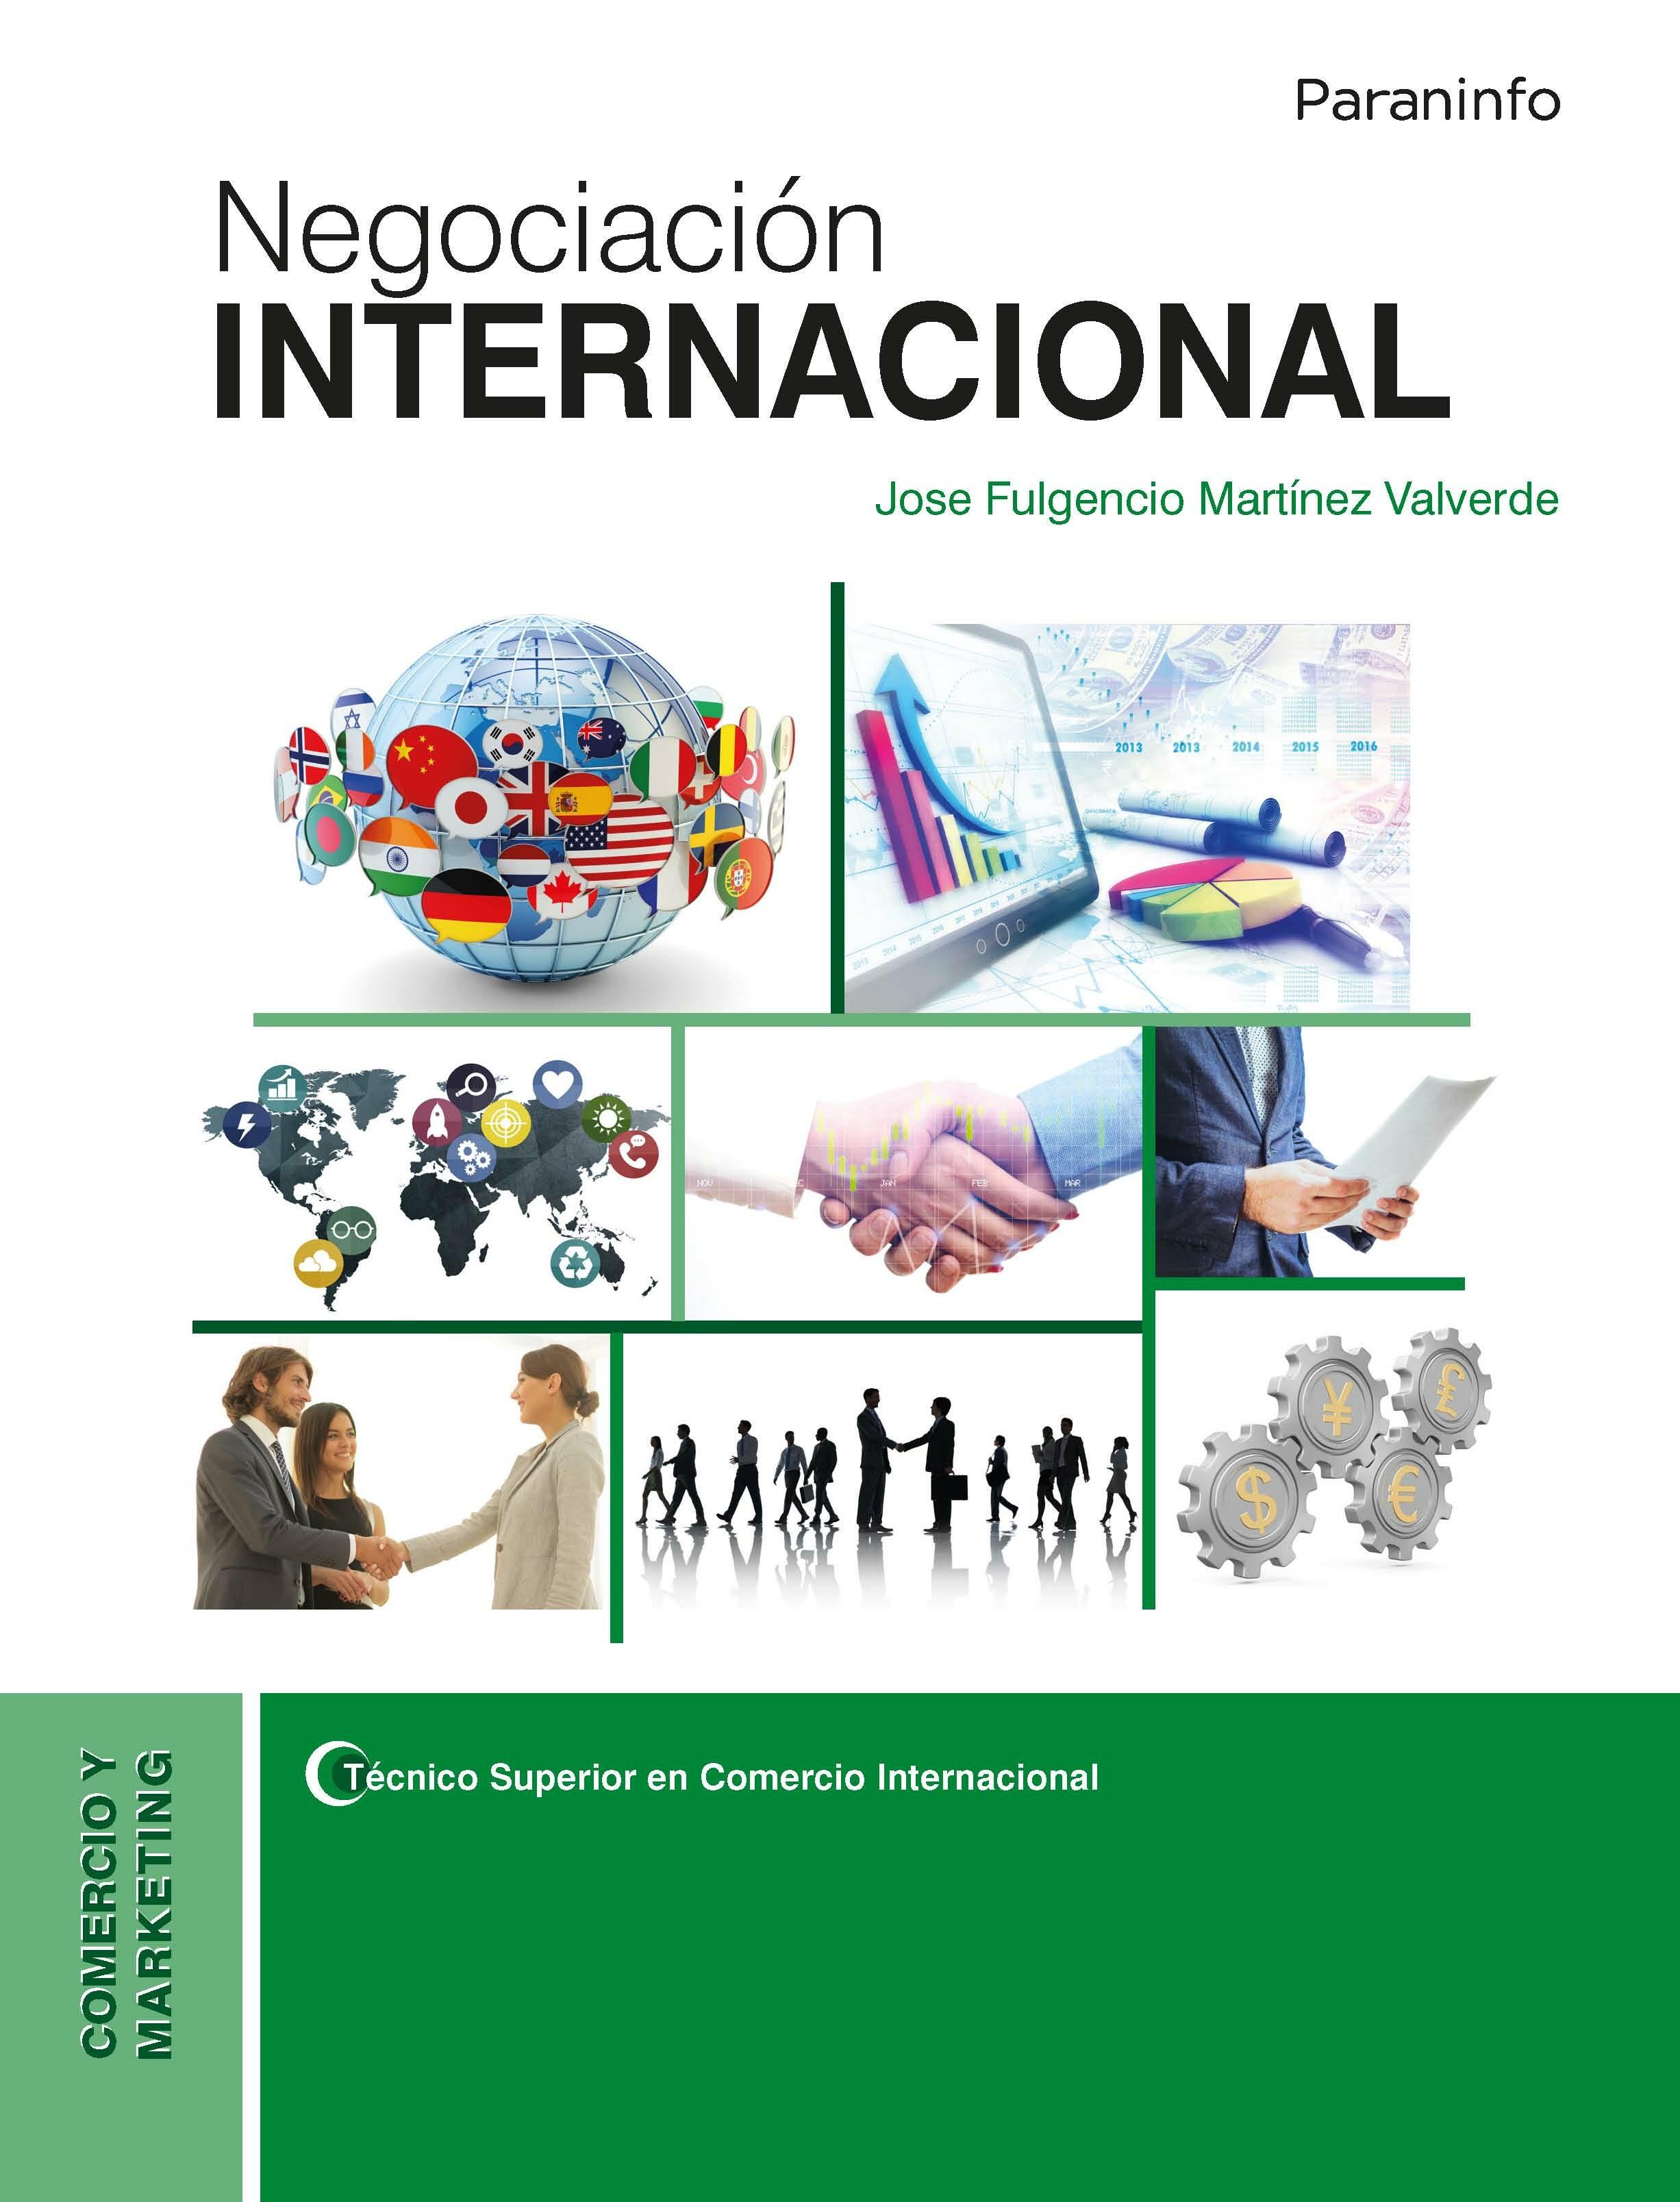 Negociacion Internacional por Jose Fulgencio Martinez Valverde